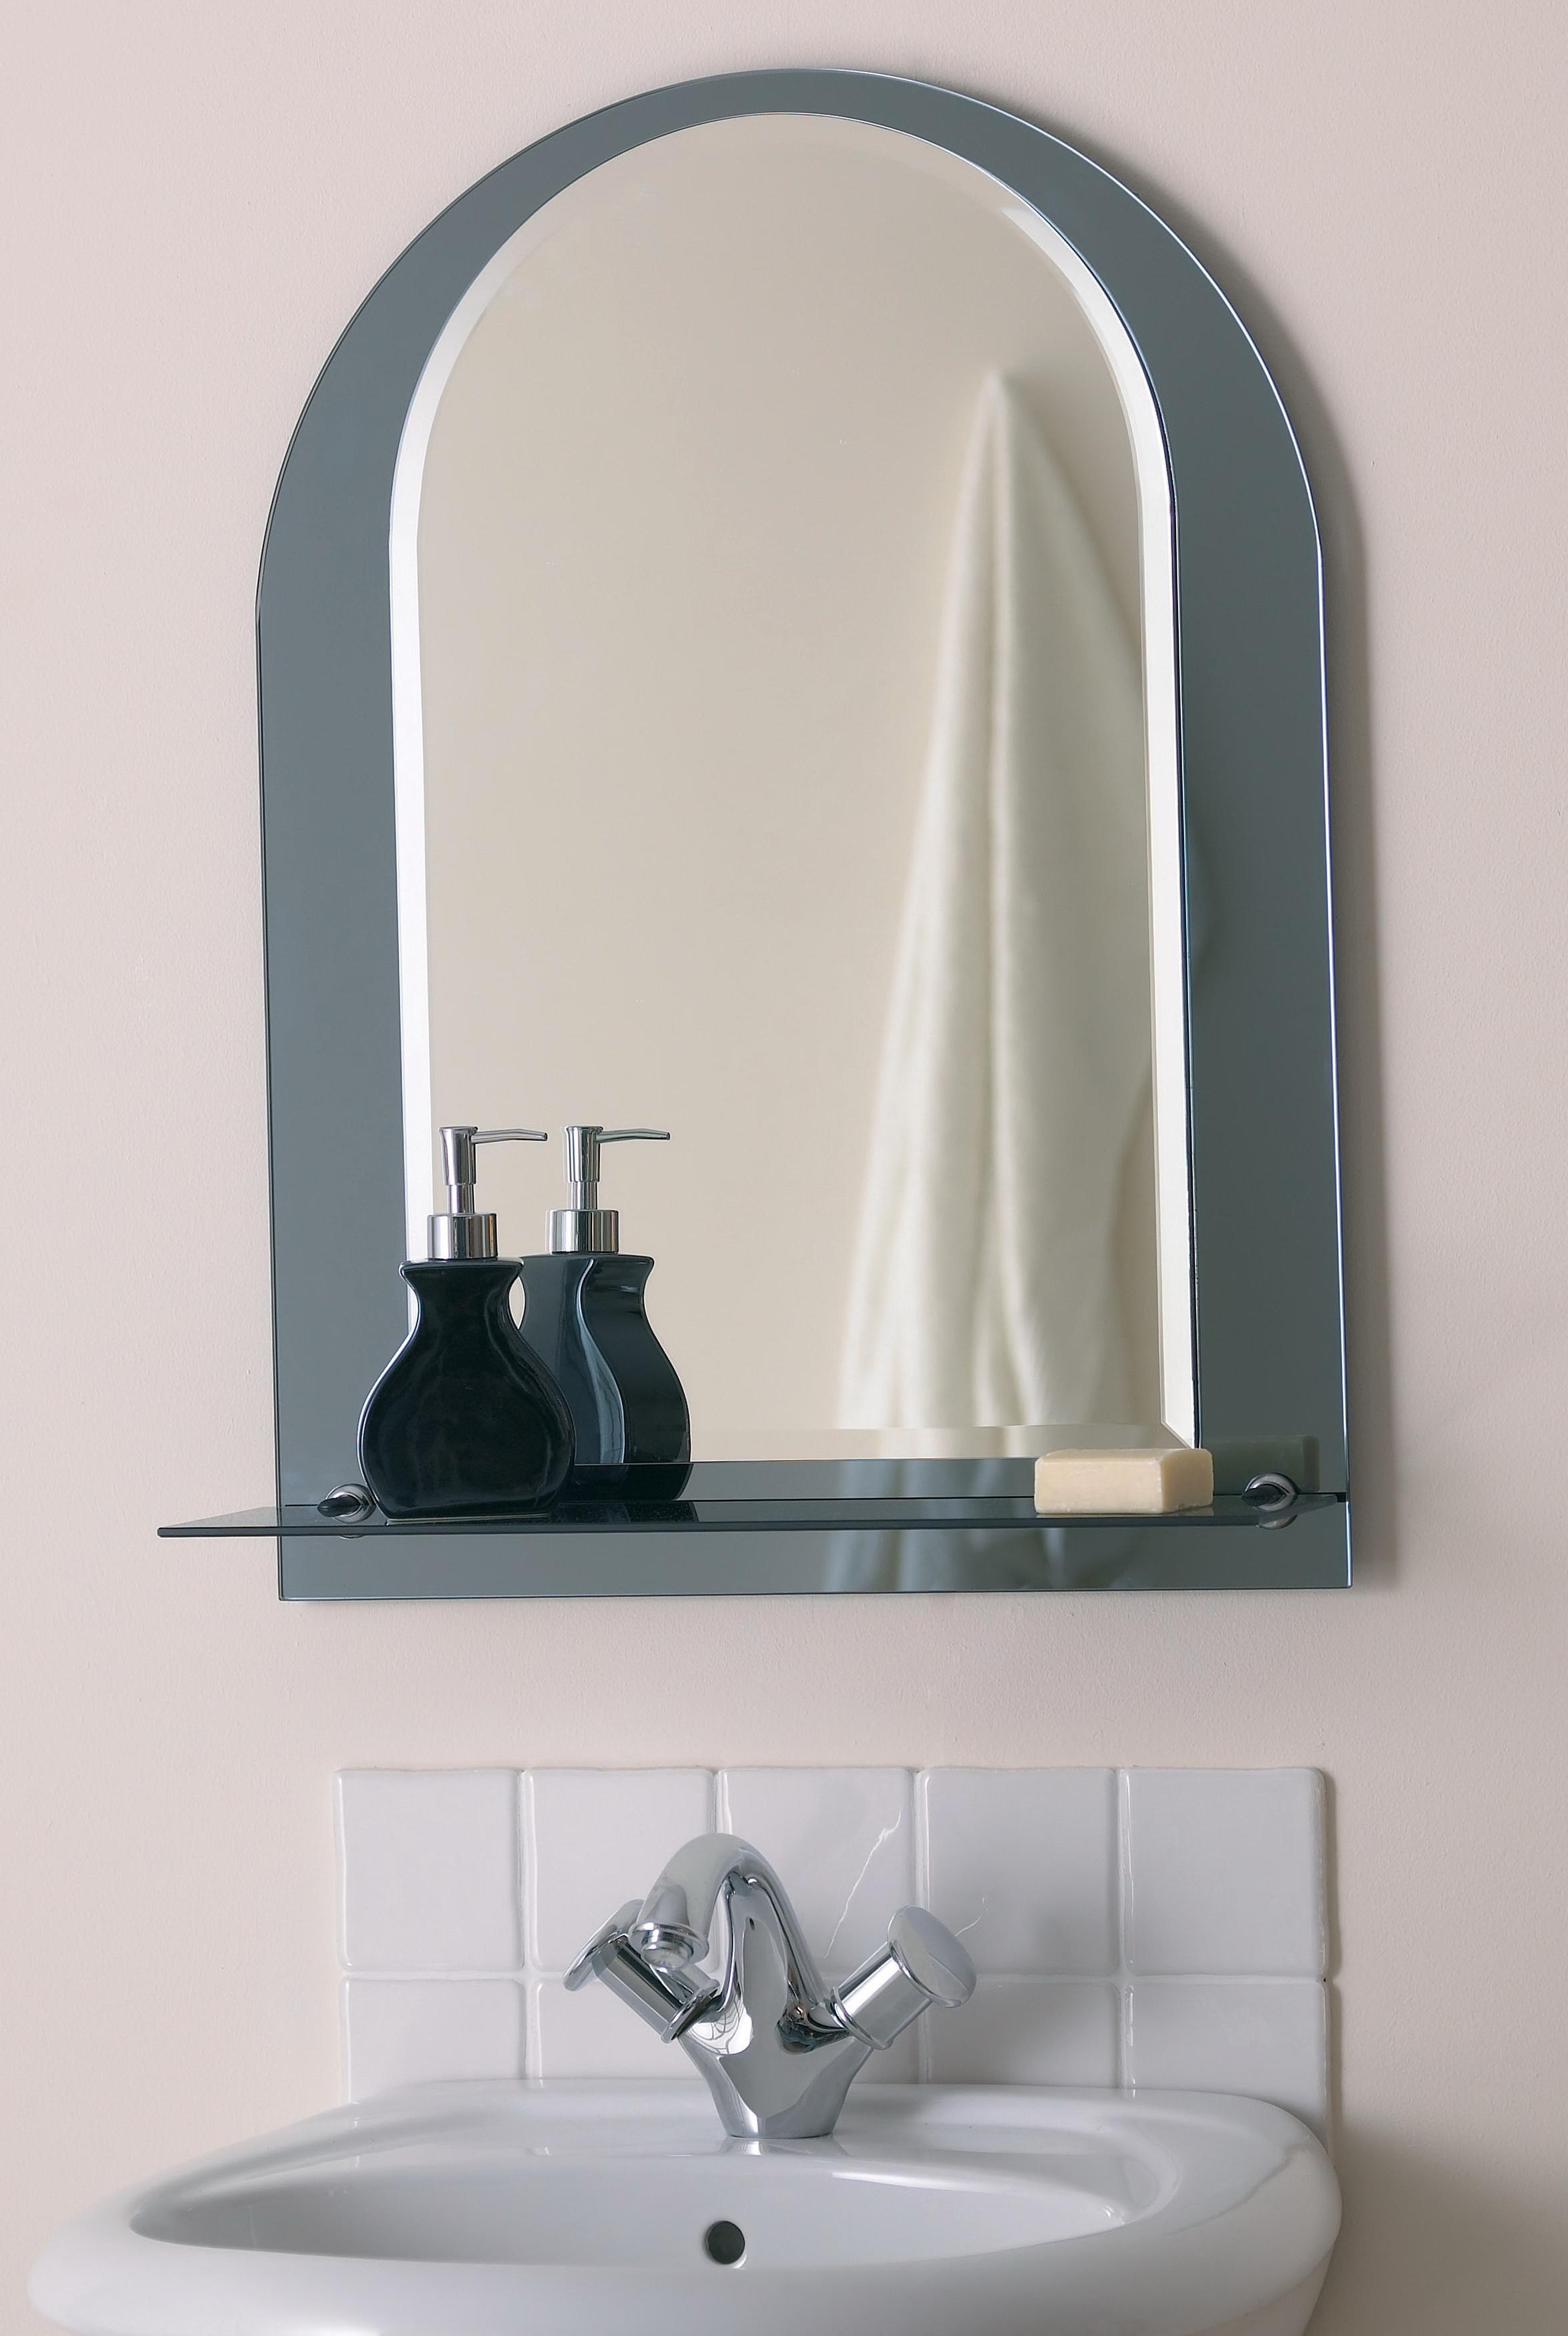 Bathroom Mirror With Shelf Attached Home Design Ideas